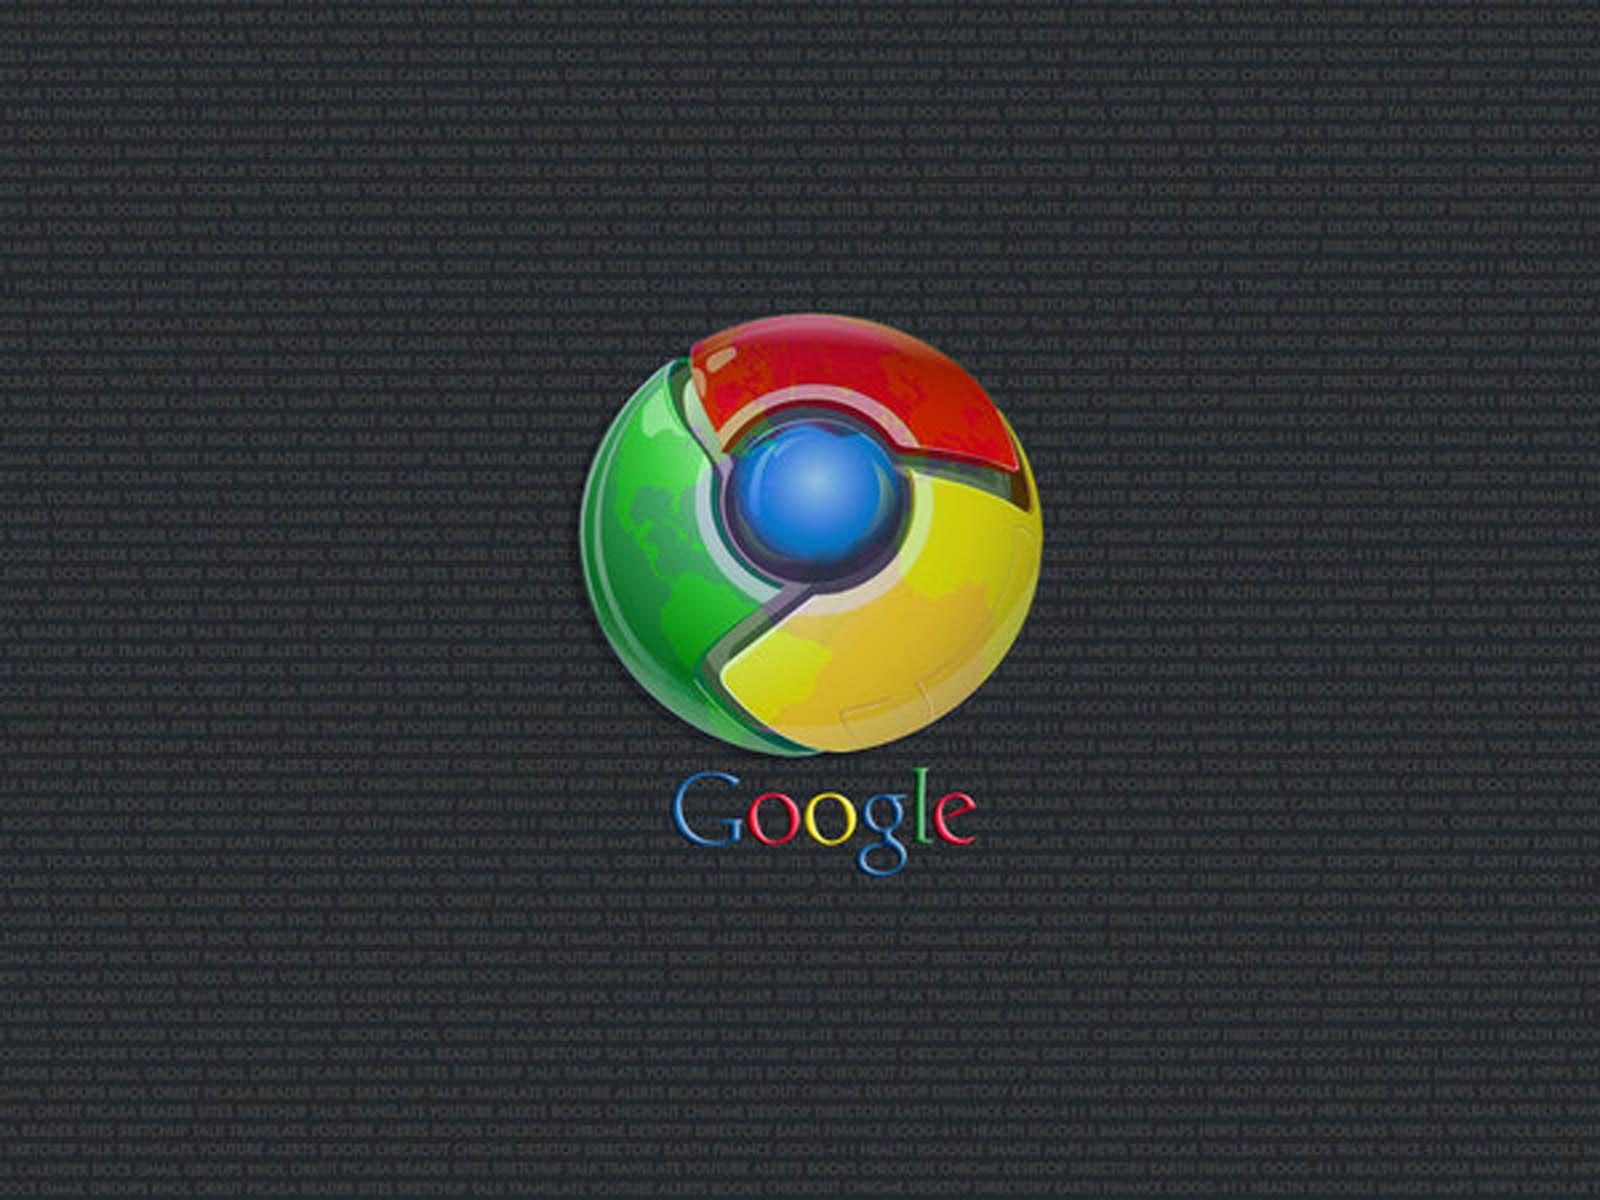 http://4.bp.blogspot.com/-9aJm0CWZwUI/UDeKyByokyI/AAAAAAAAIM4/YRQ_8b1qu9M/s1600/Google%2BChrome%2BWallpapers%2B4.jpg